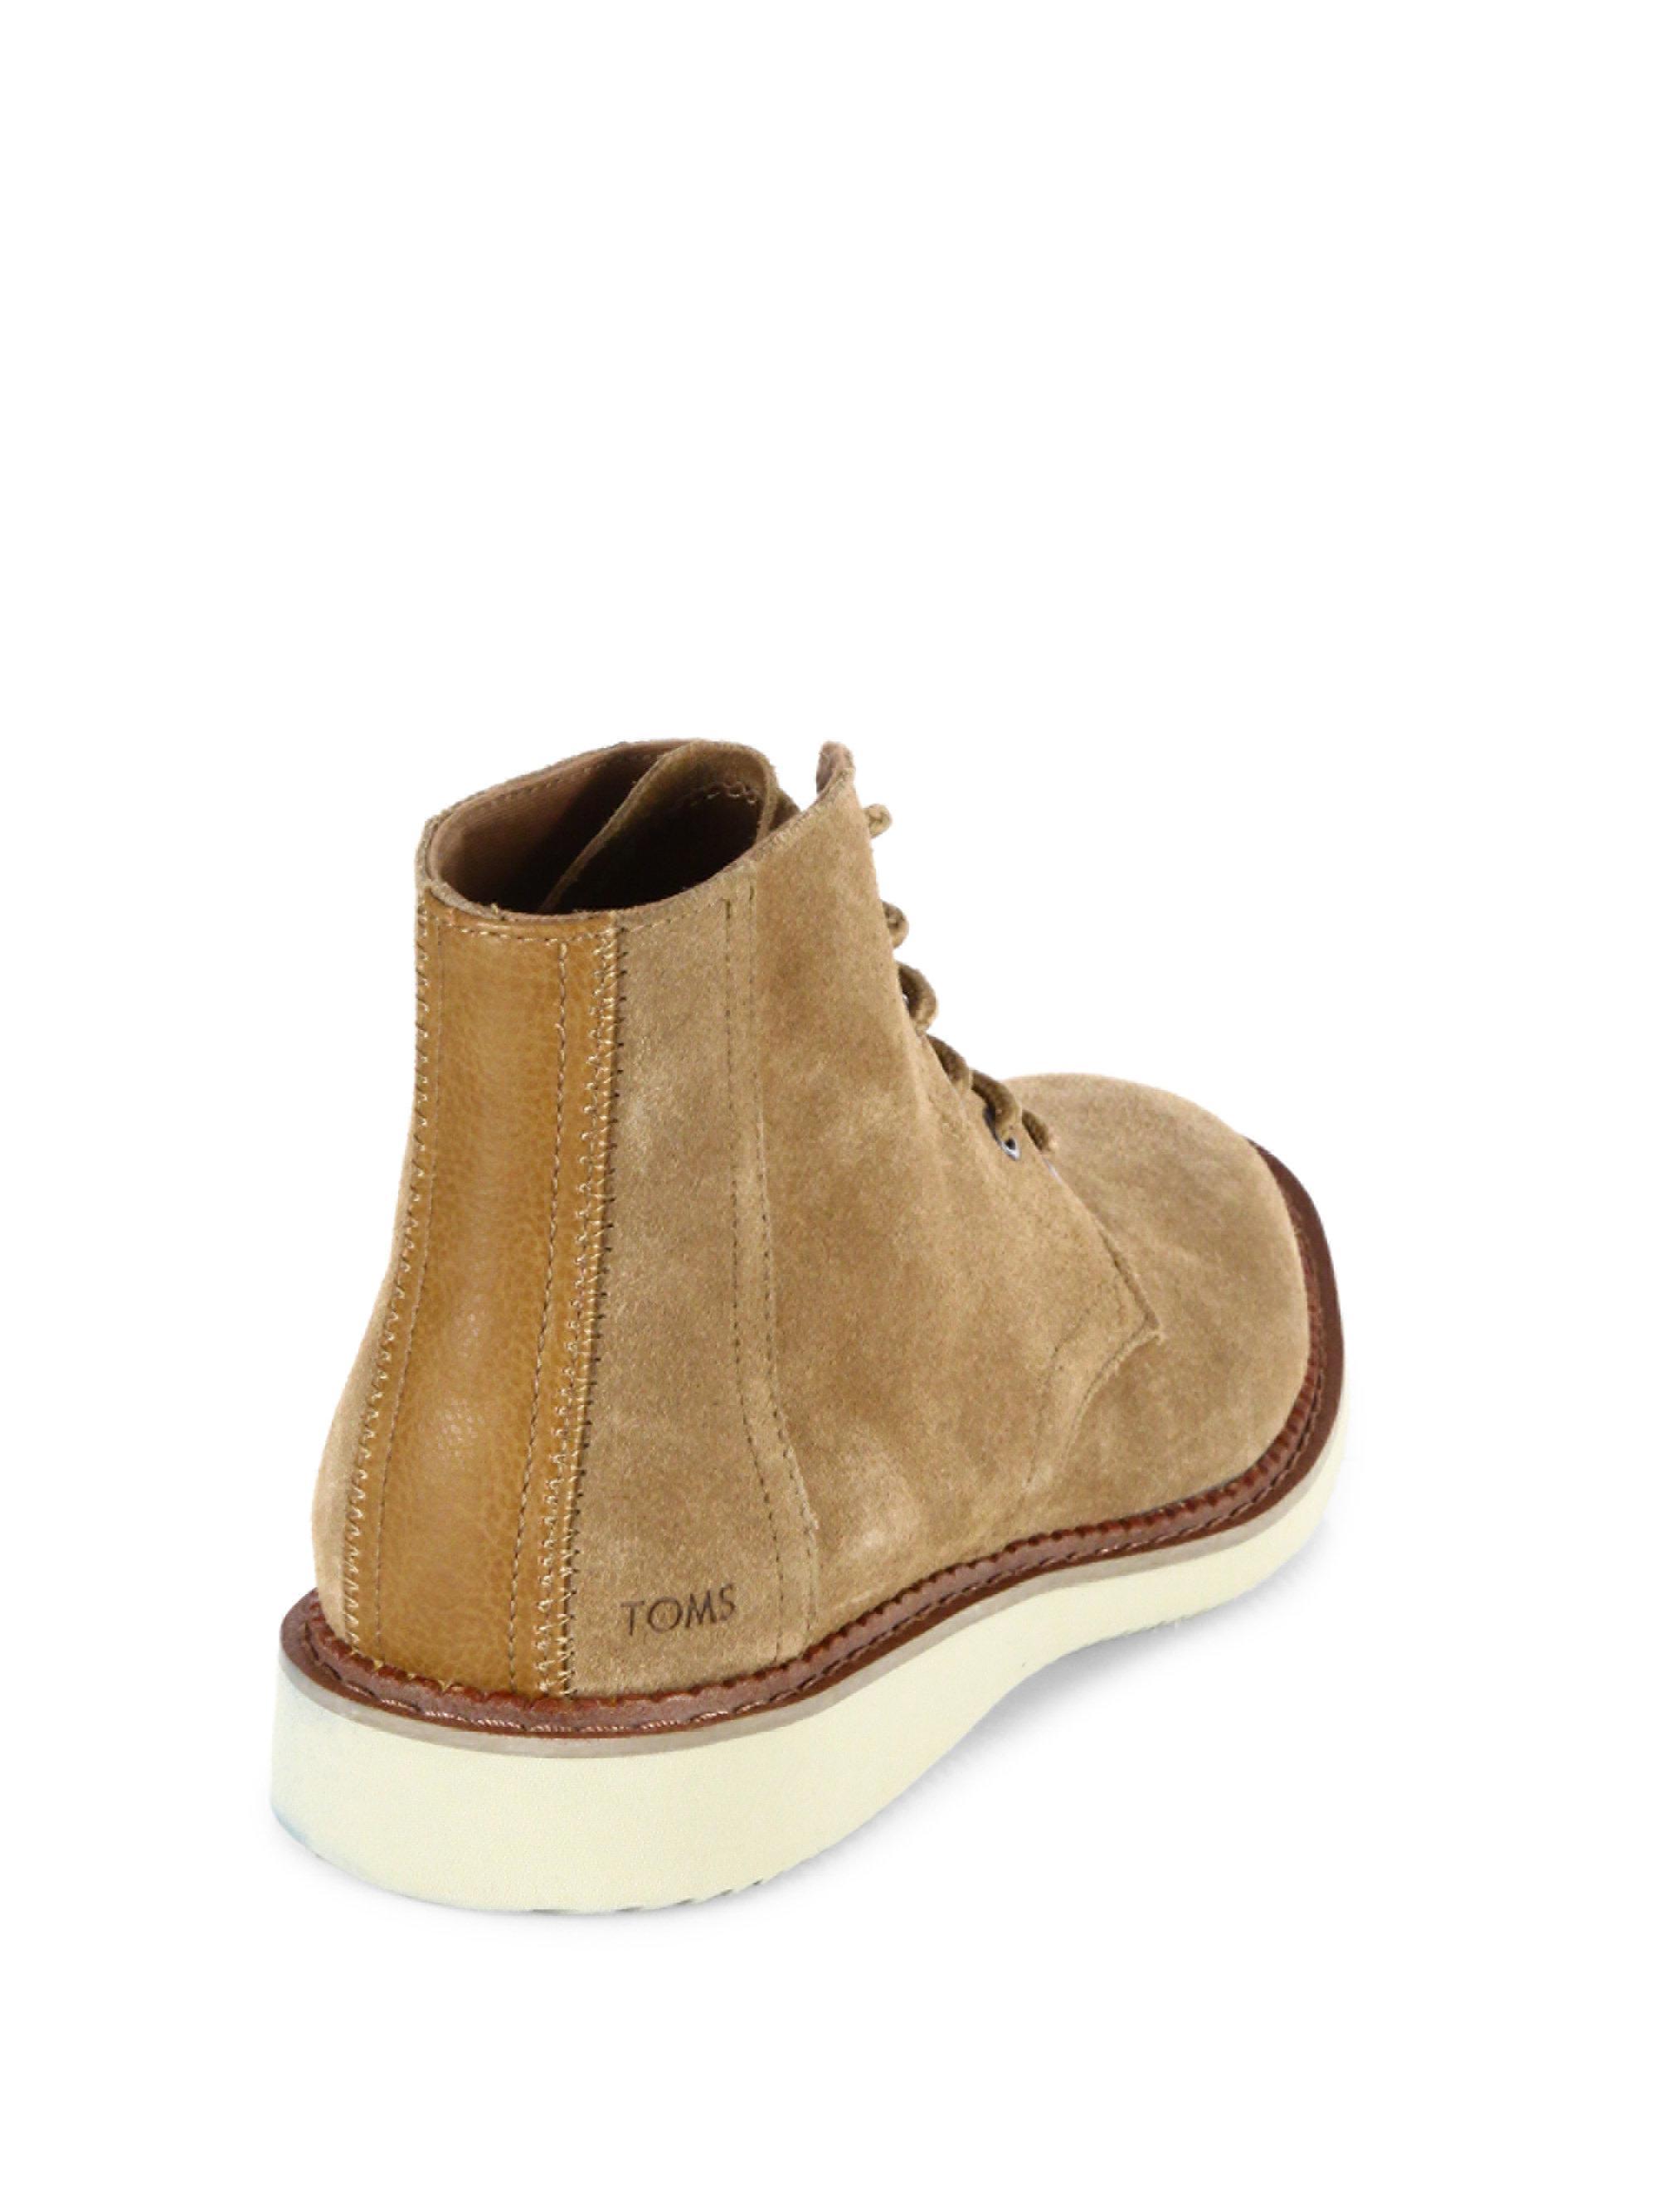 3aec2eb5ef3 TOMS Porter Suede Desert Boots in Natural for Men - Lyst